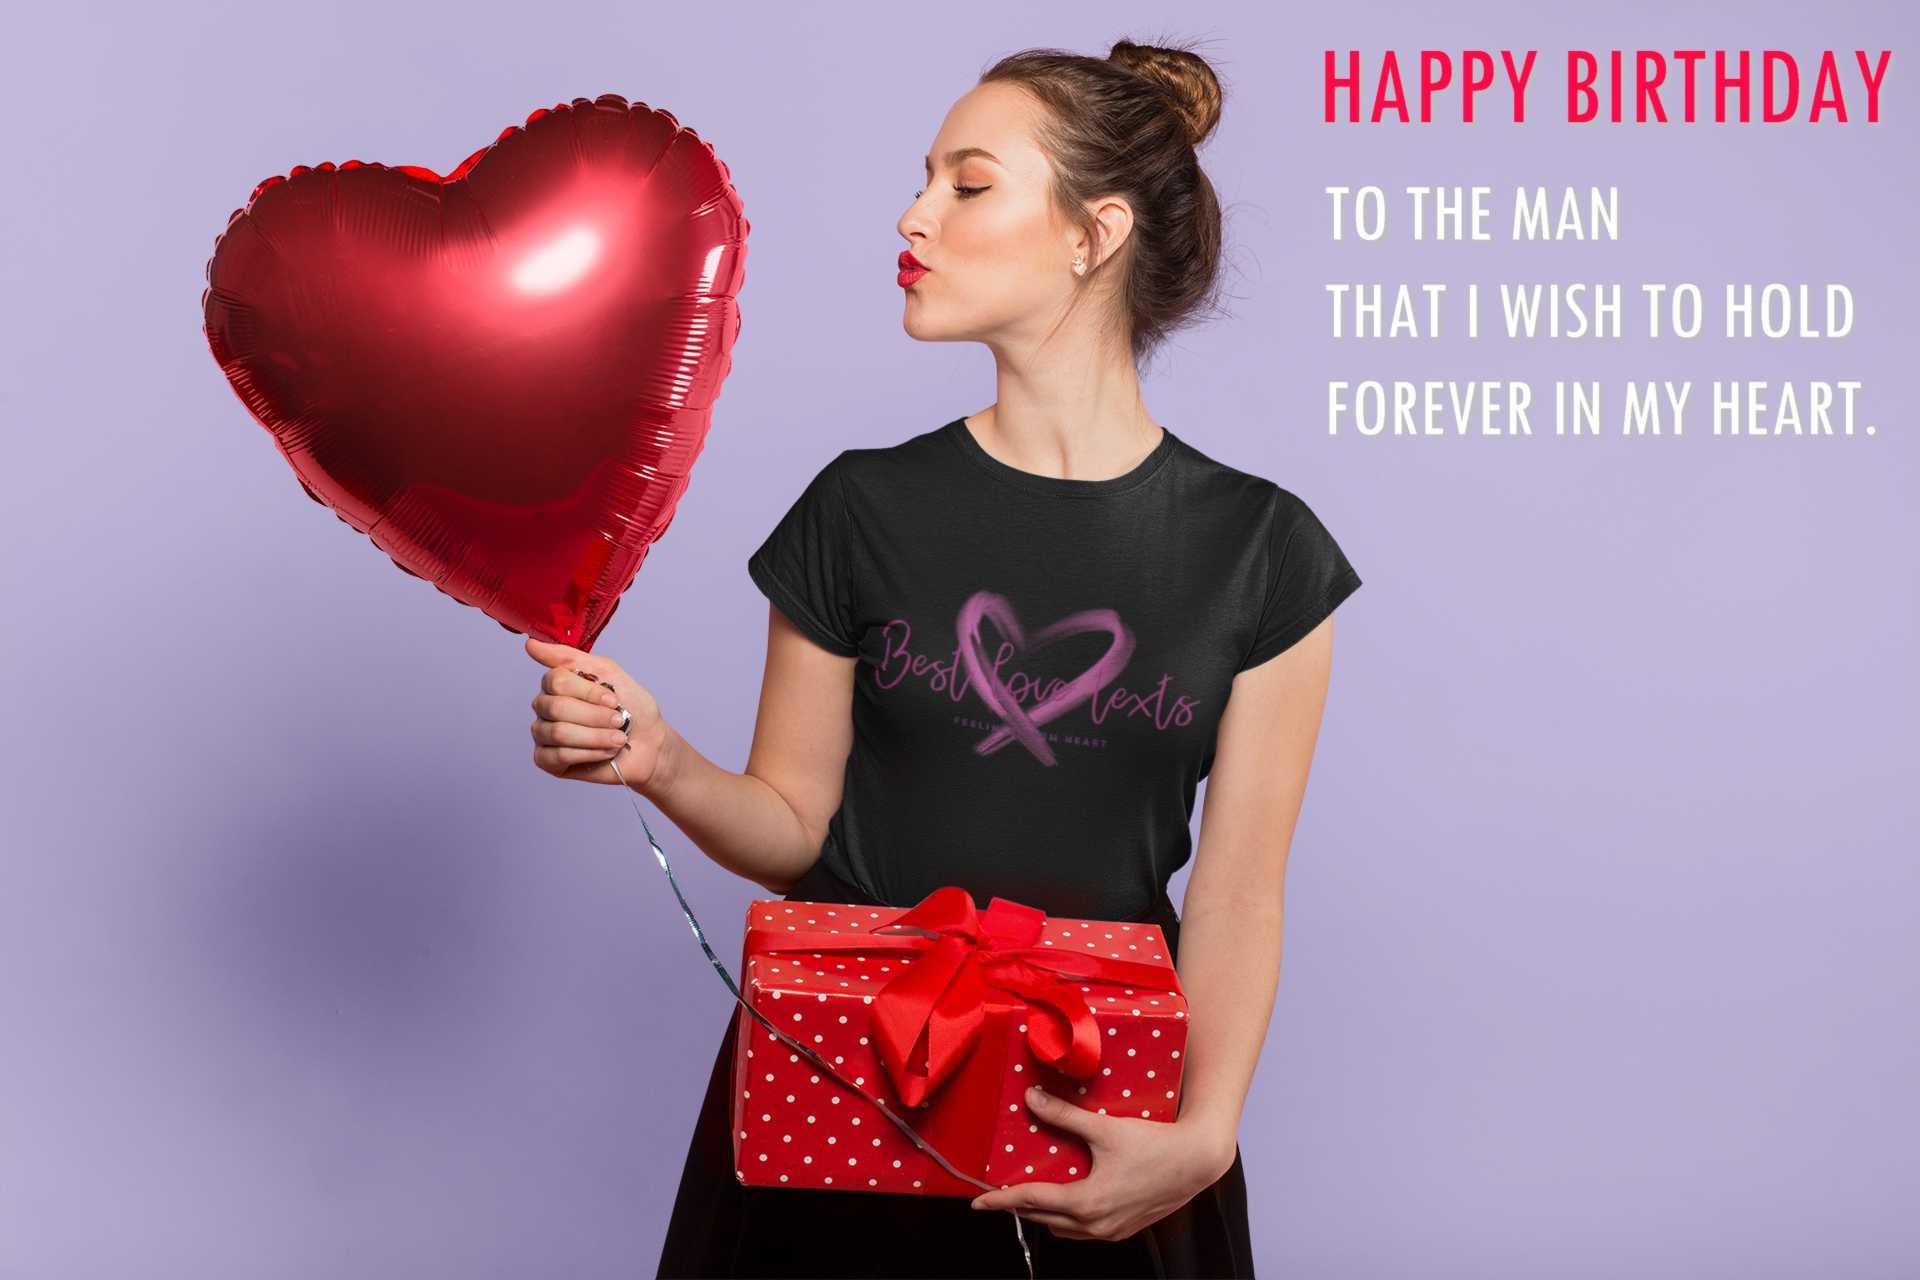 Wishing your boyfriend a happy birthday